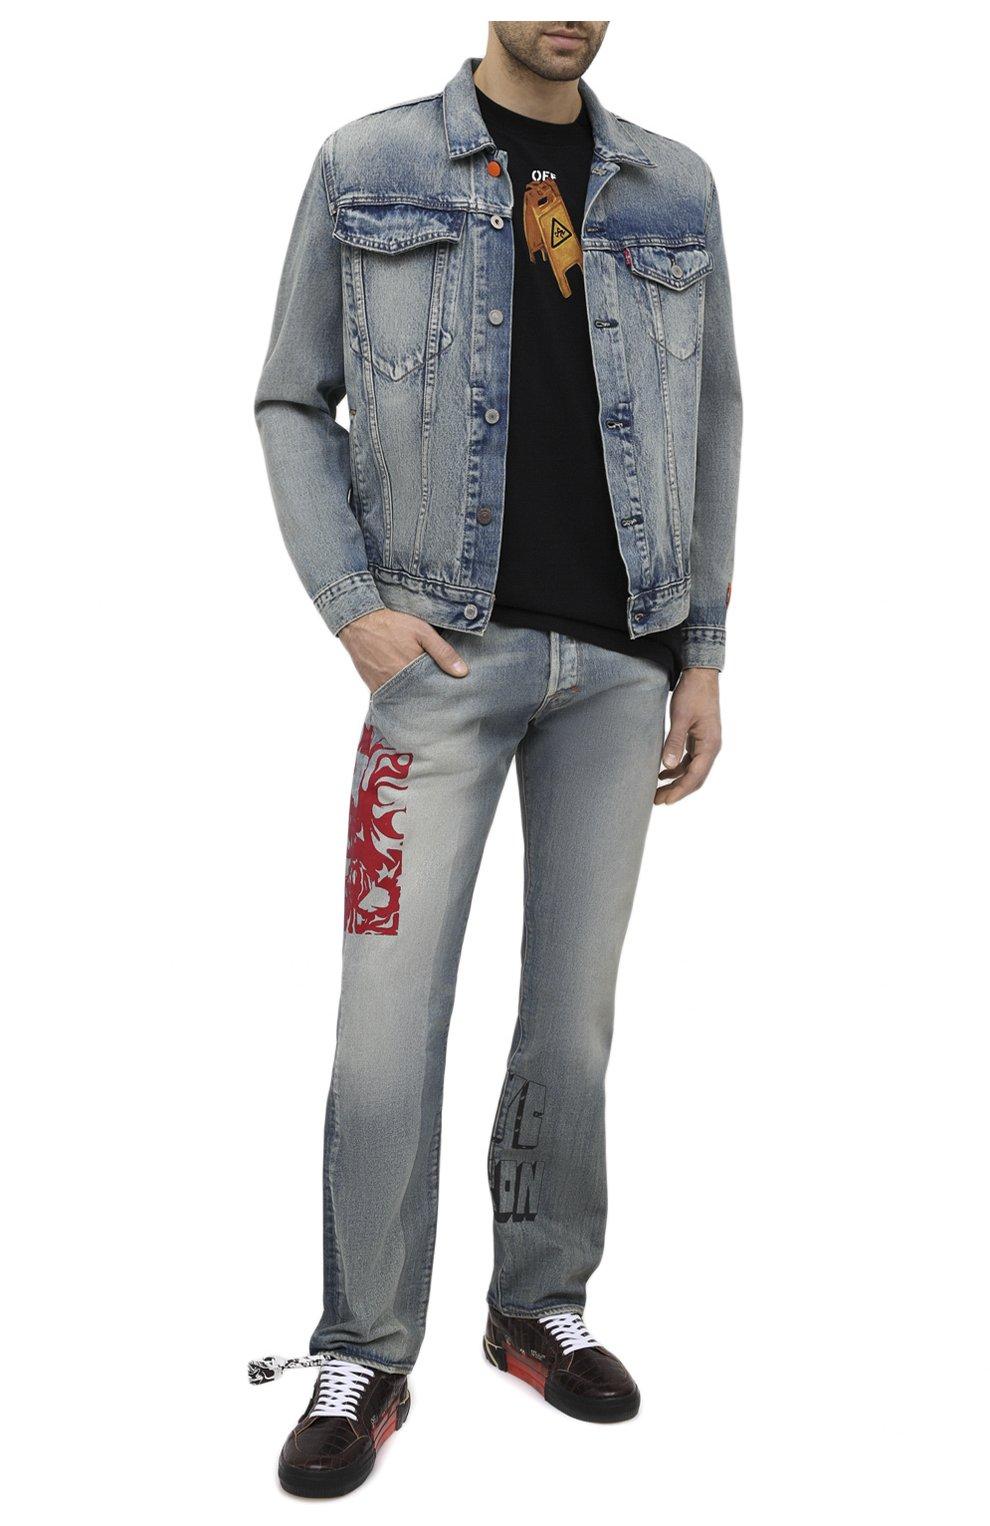 Мужская джинсовая куртка heron preston x levi's HERON PRESTON синего цвета, арт. HMYE006S209250237388 | Фото 2